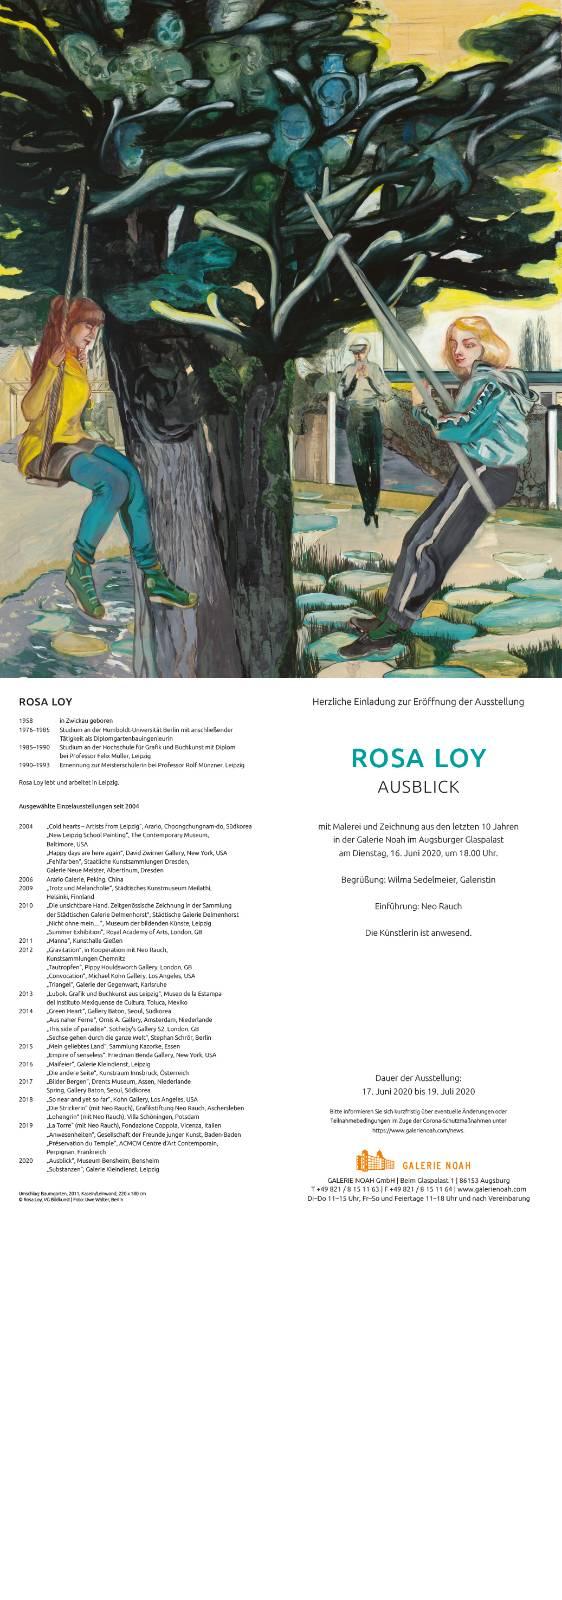 Rosa Loy | Ausblick